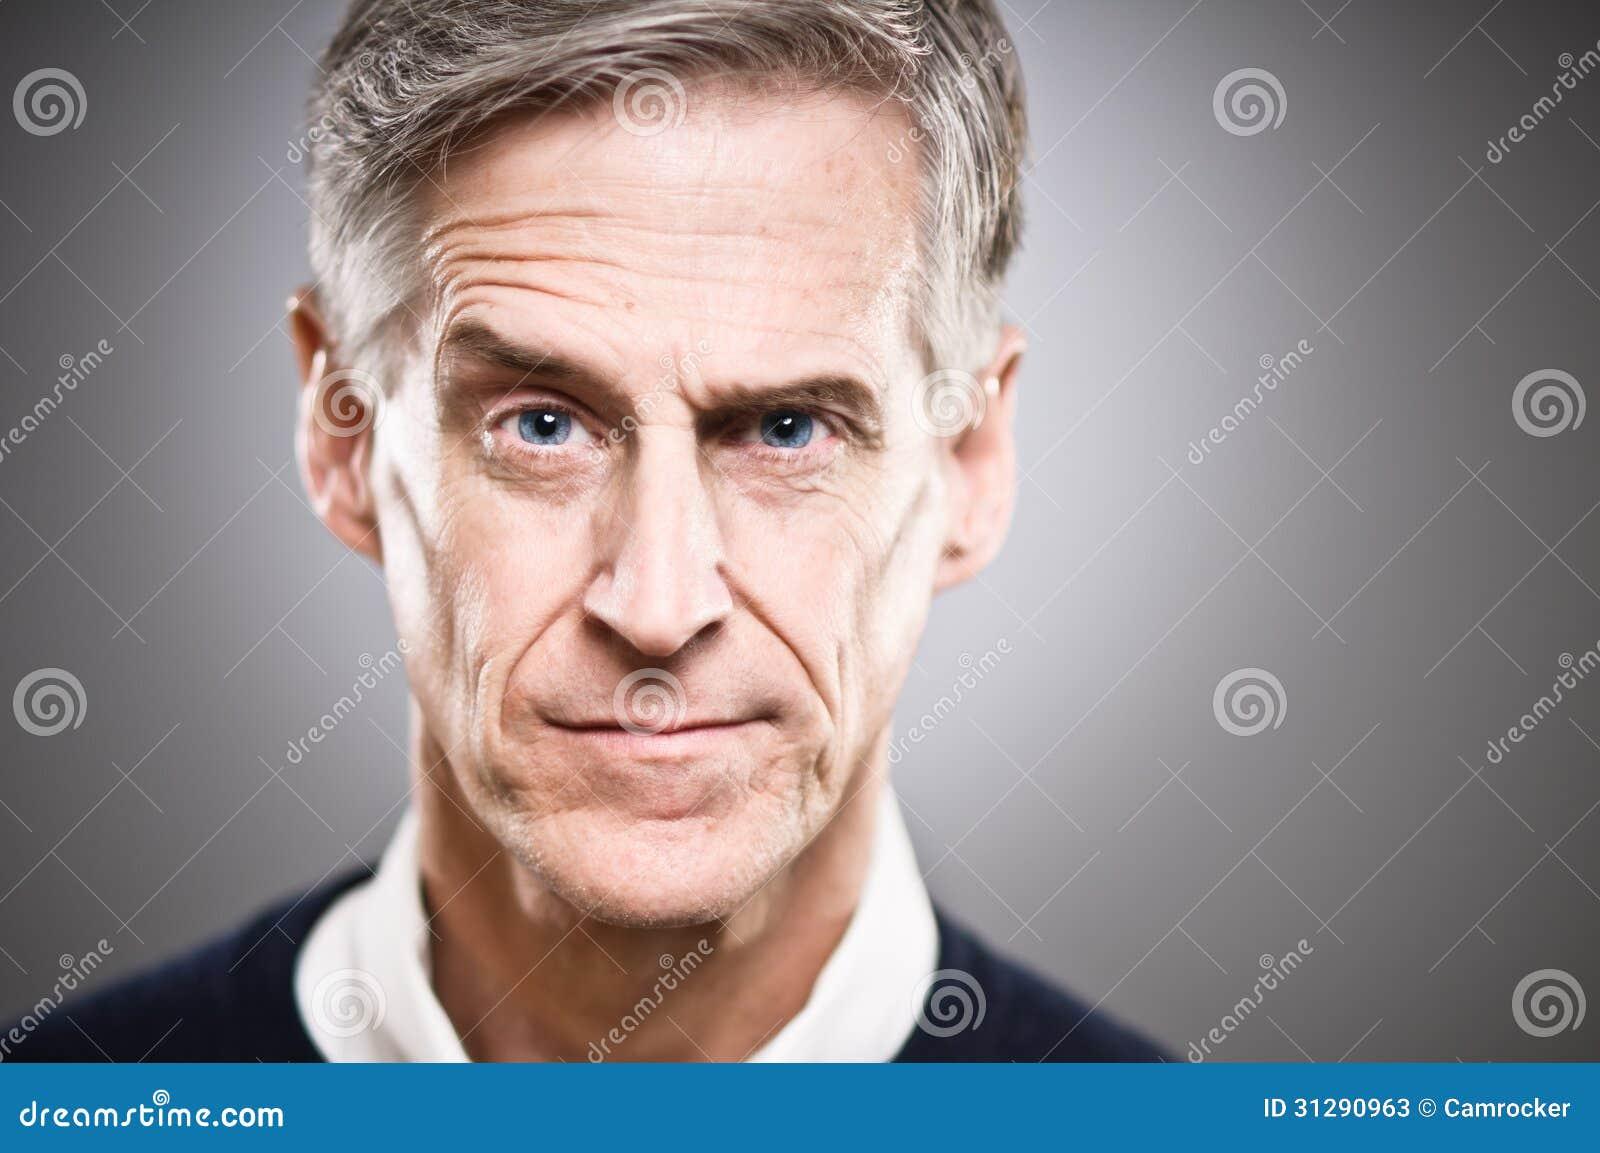 Mature Caucasian Man With Raised Eyebrow Portrait Stock Image